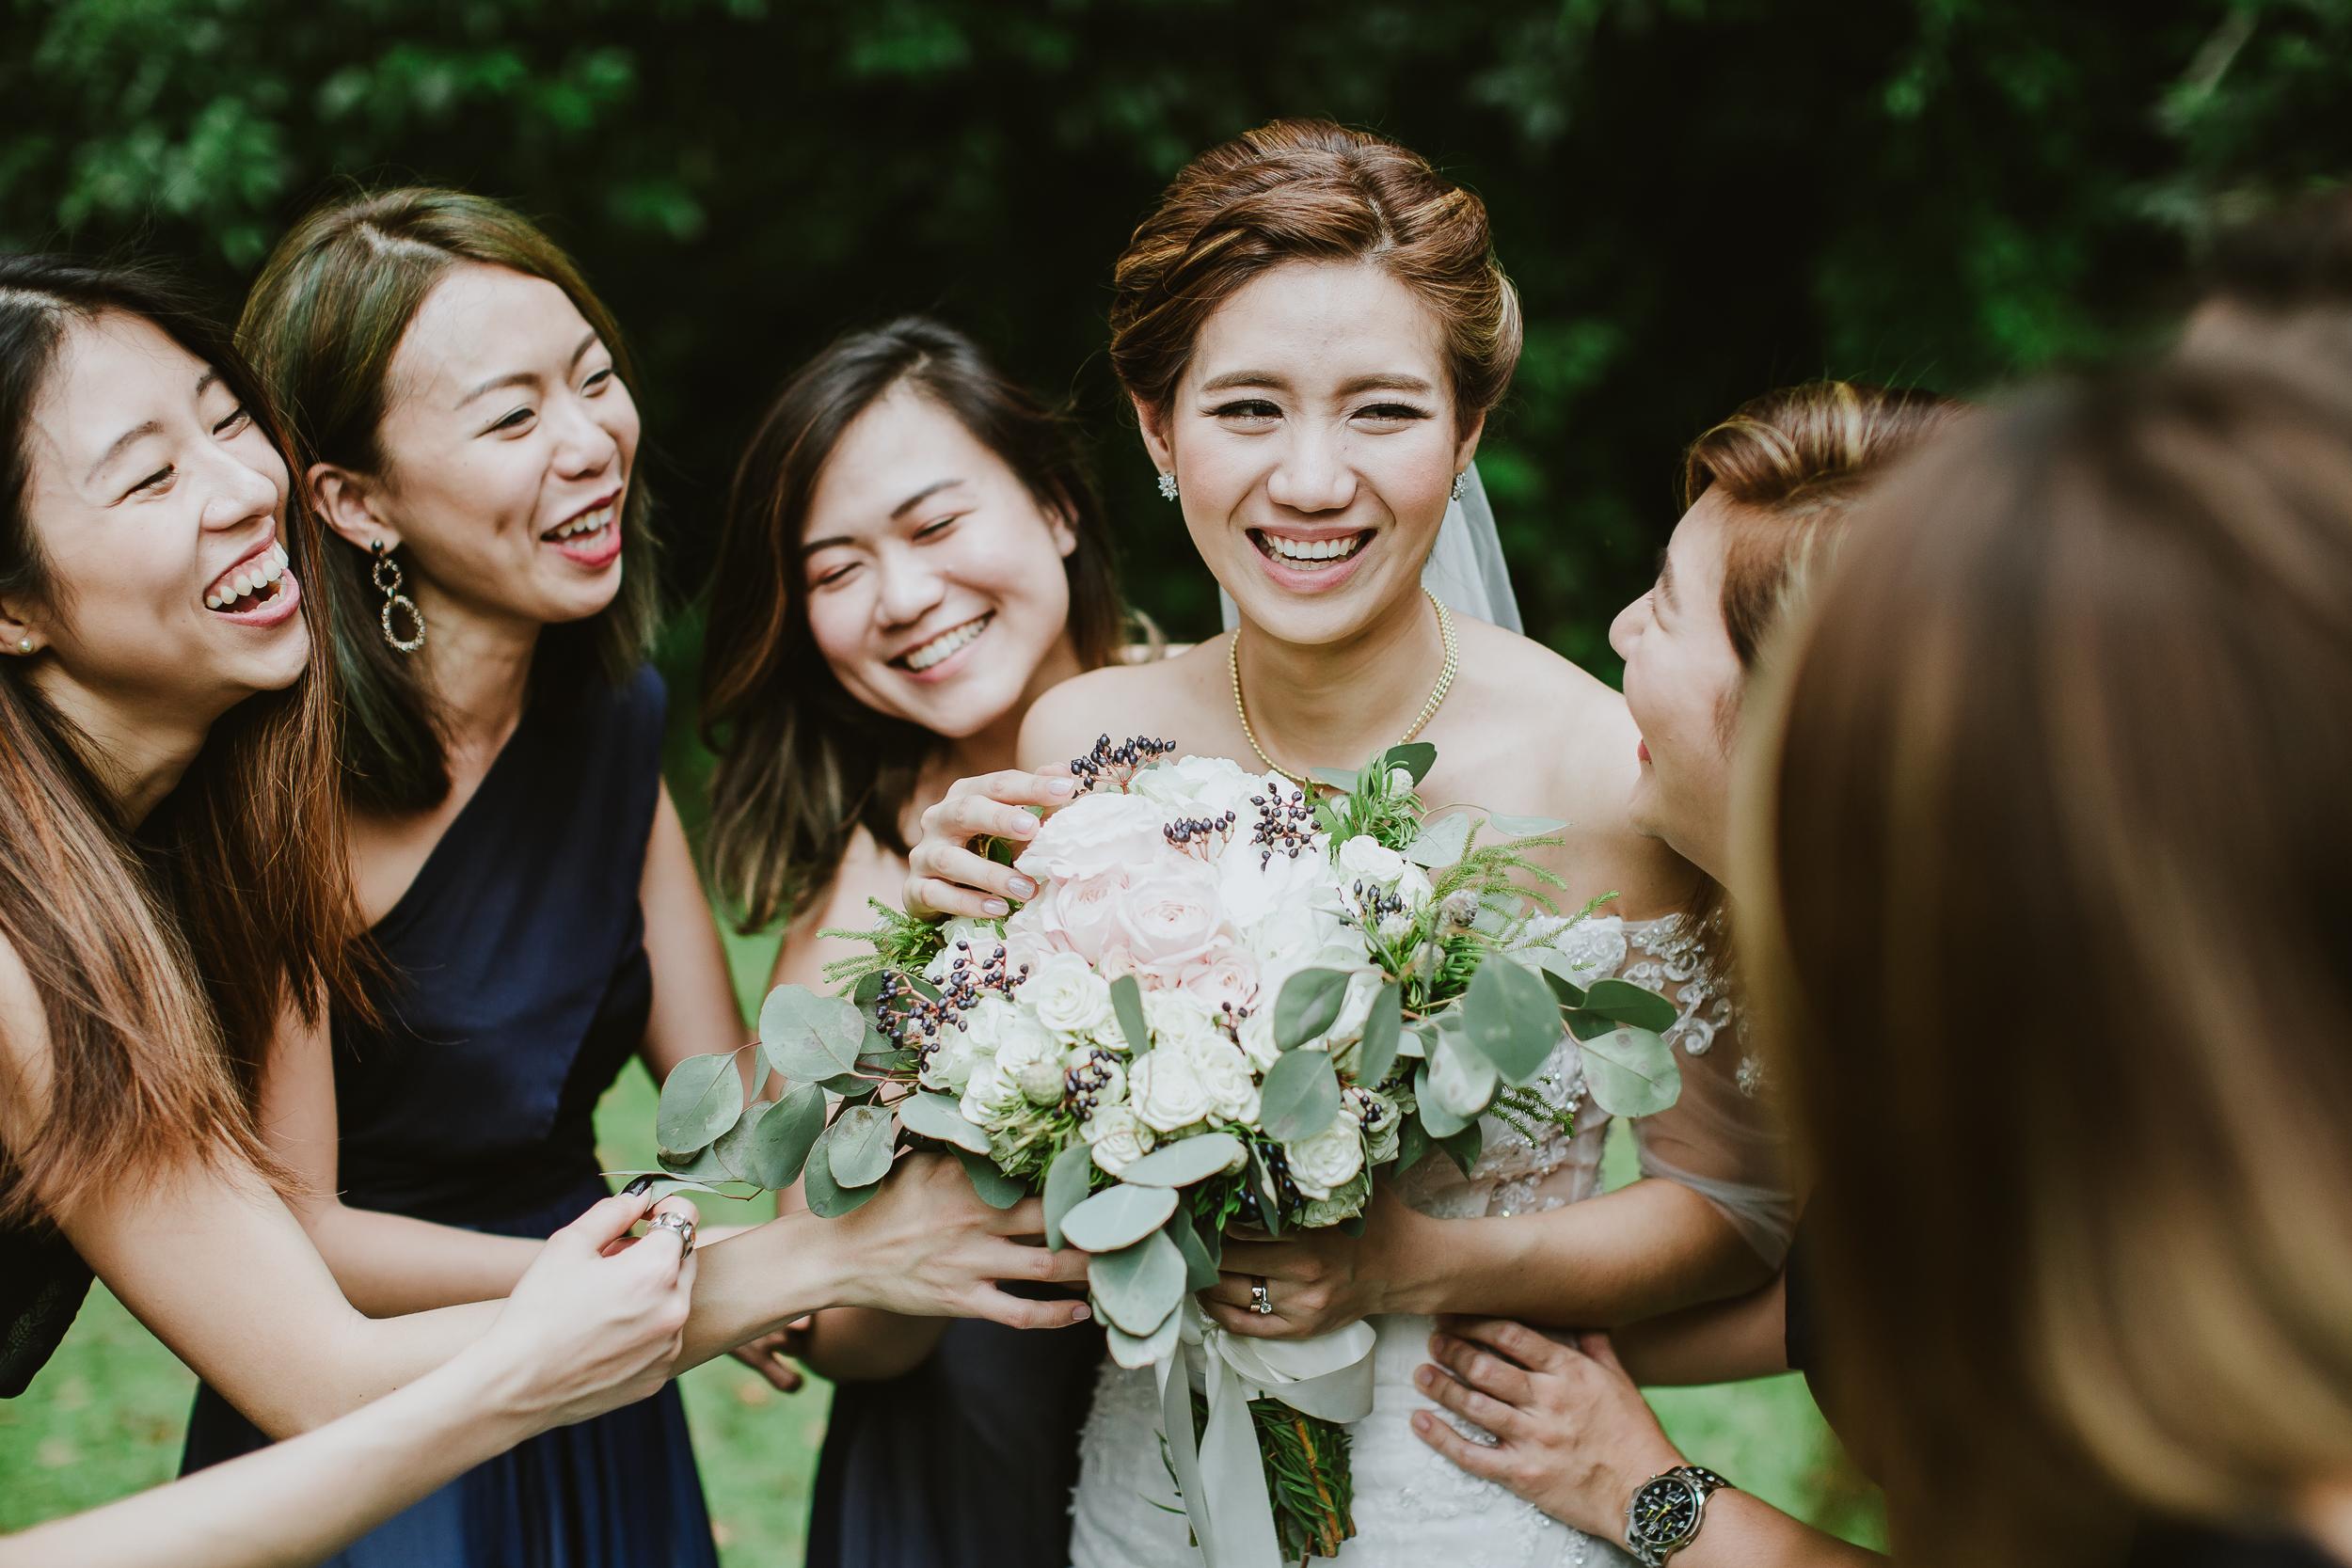 Singapore+Actual+Day+Wedding+Photographer+Raffles+Town+Club+Jeremiah+Christina-0071.jpg